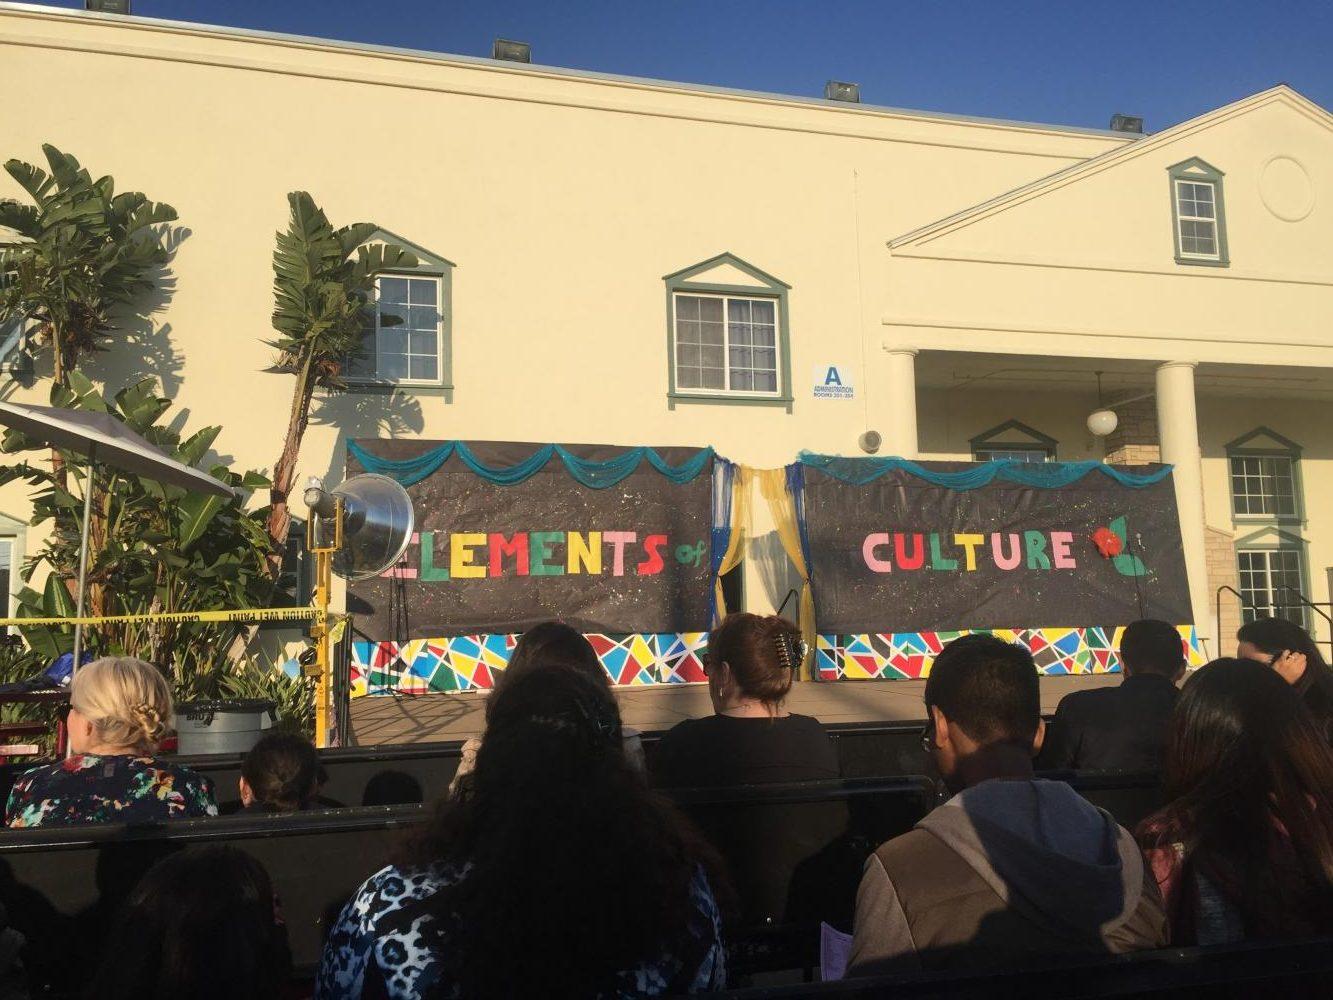 Elements+of+Culture.+Photo+Source%3A+Cristina+G.